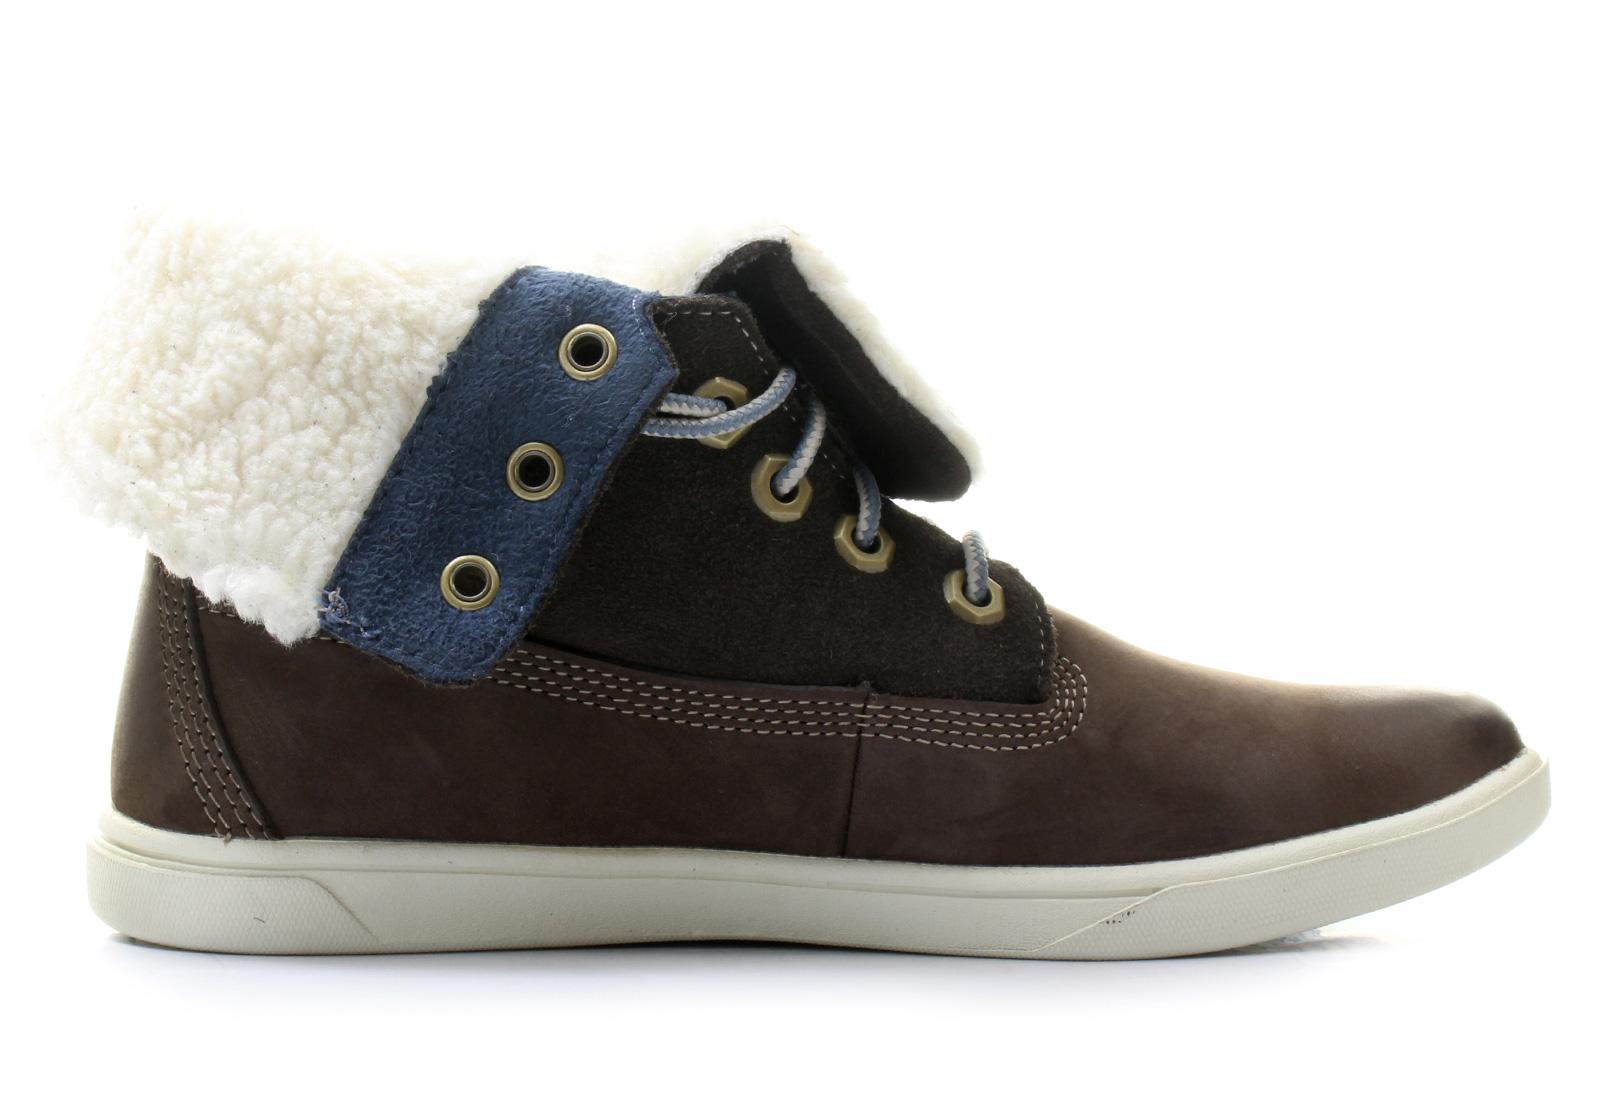 e09093eca166 Timberland Boots - Groveton Girls Deering Fold Down - a164y-dbr ...